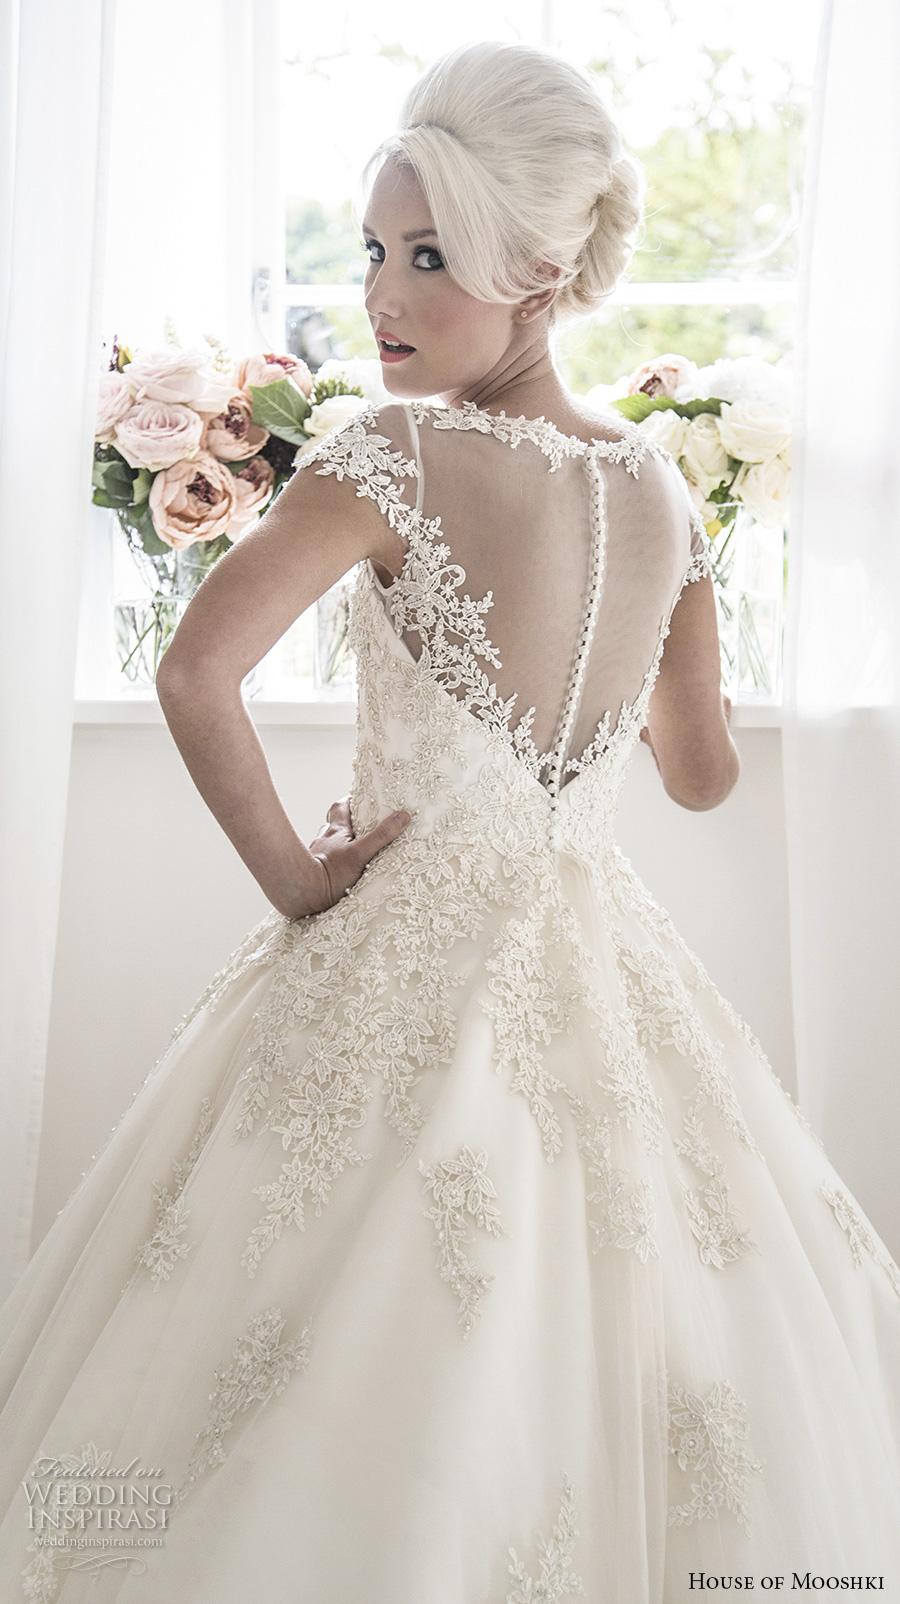 House Of Mooshki 2017 Wedding Dresses Wedding Inspirasi